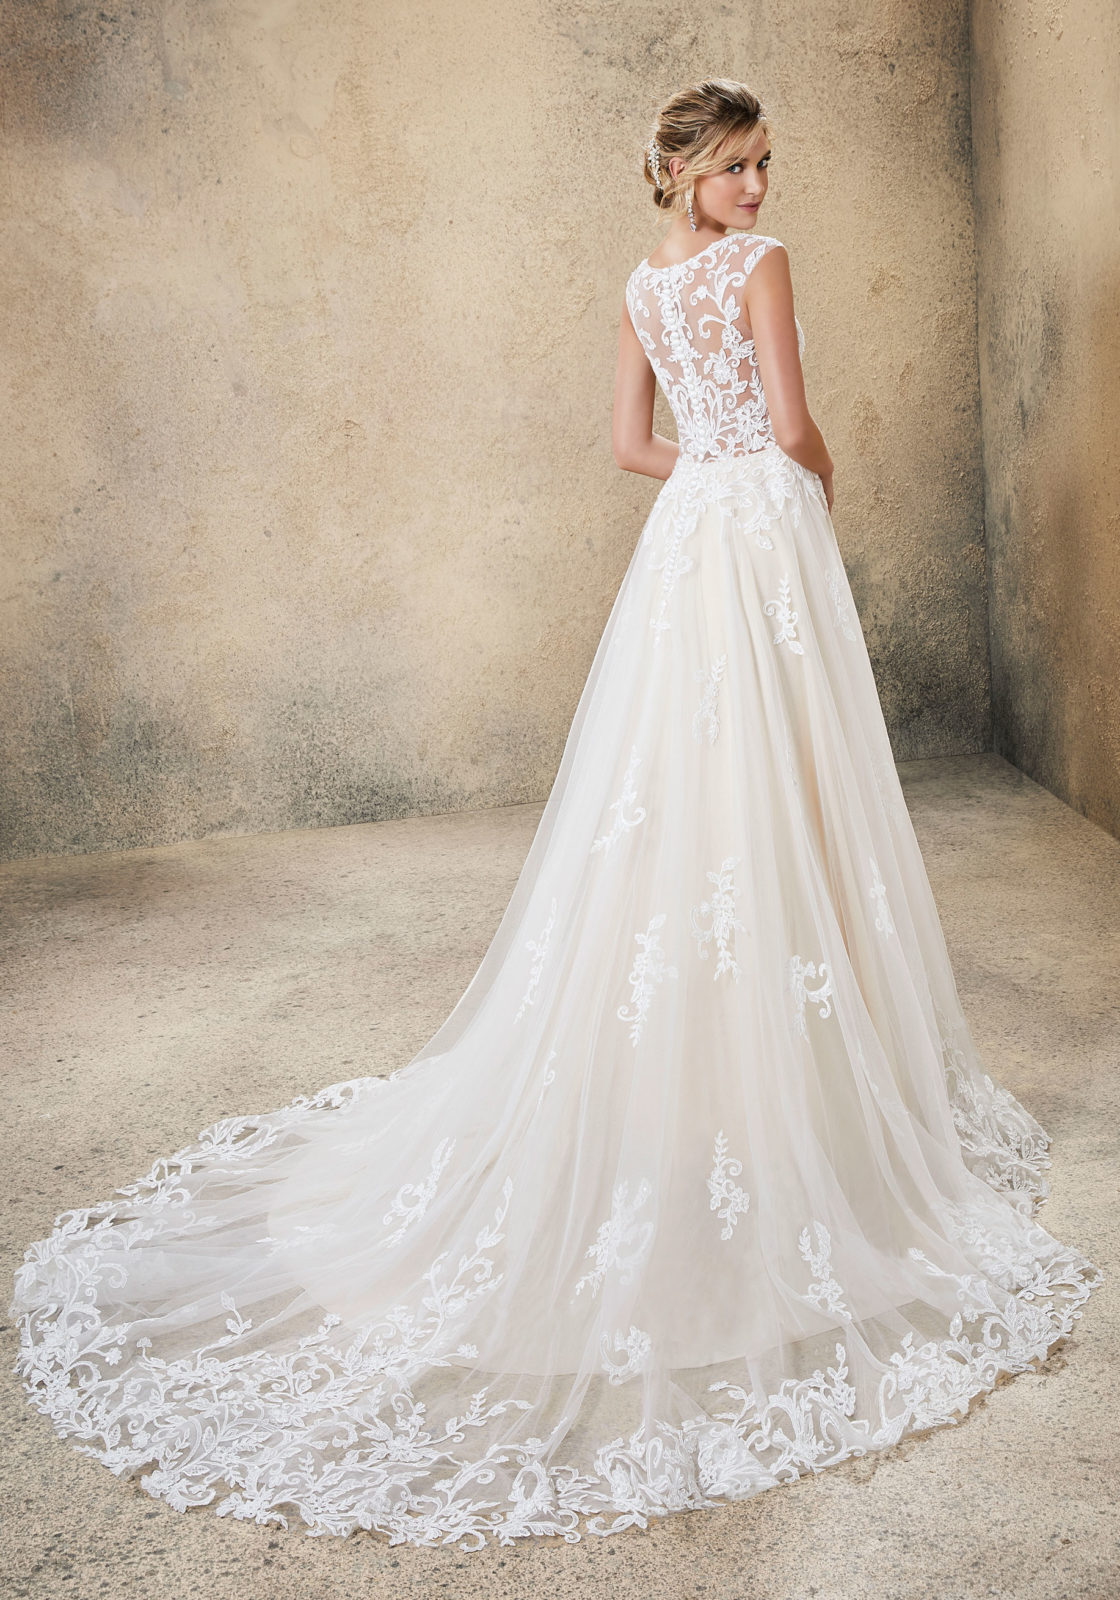 Ronan Wedding Dress Morilee New Wedding Dresses Tea Length Wedding Dress Wedding Dresses,Pregnant Dresses For Wedding Guest